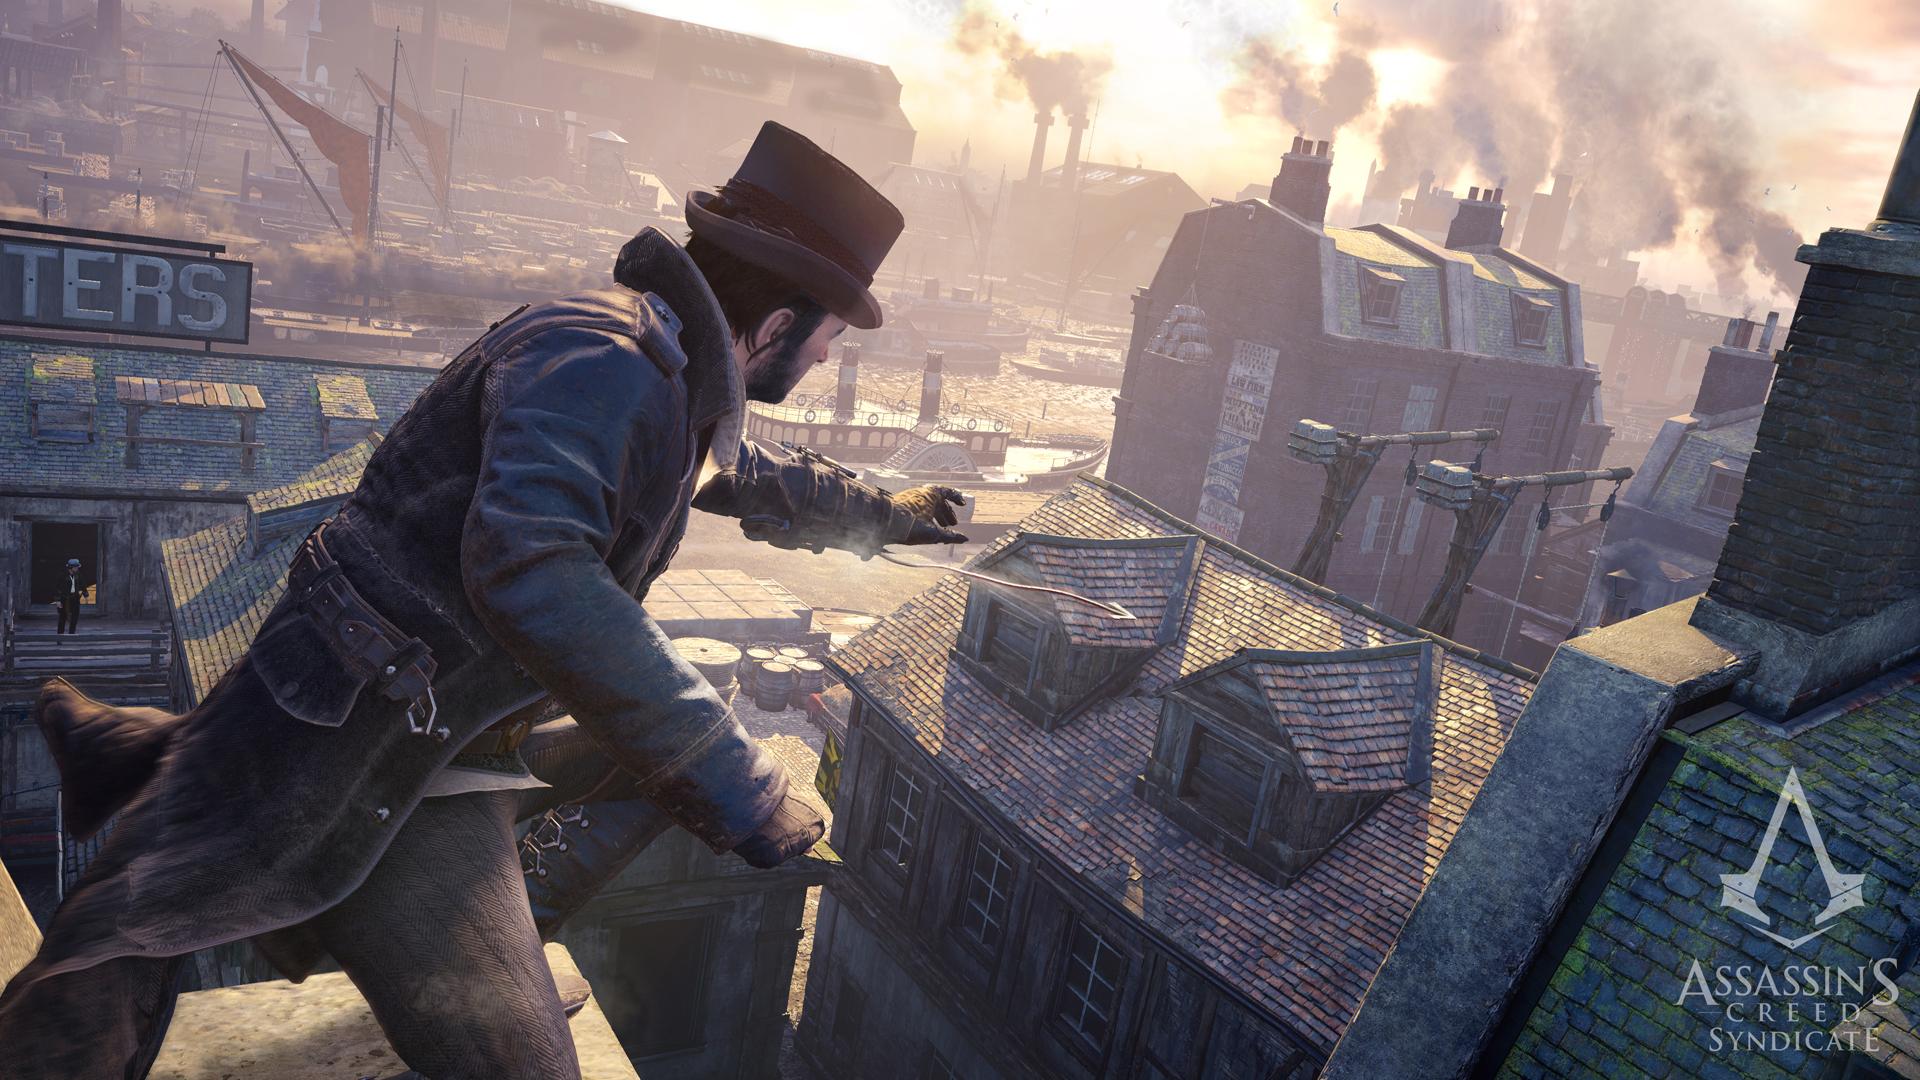 Assassin'S Creed Syndicate ESPAÑOL PC Full + Update v1.21 (CODEX) + REPACK 6 DVD5 (JPW) 3